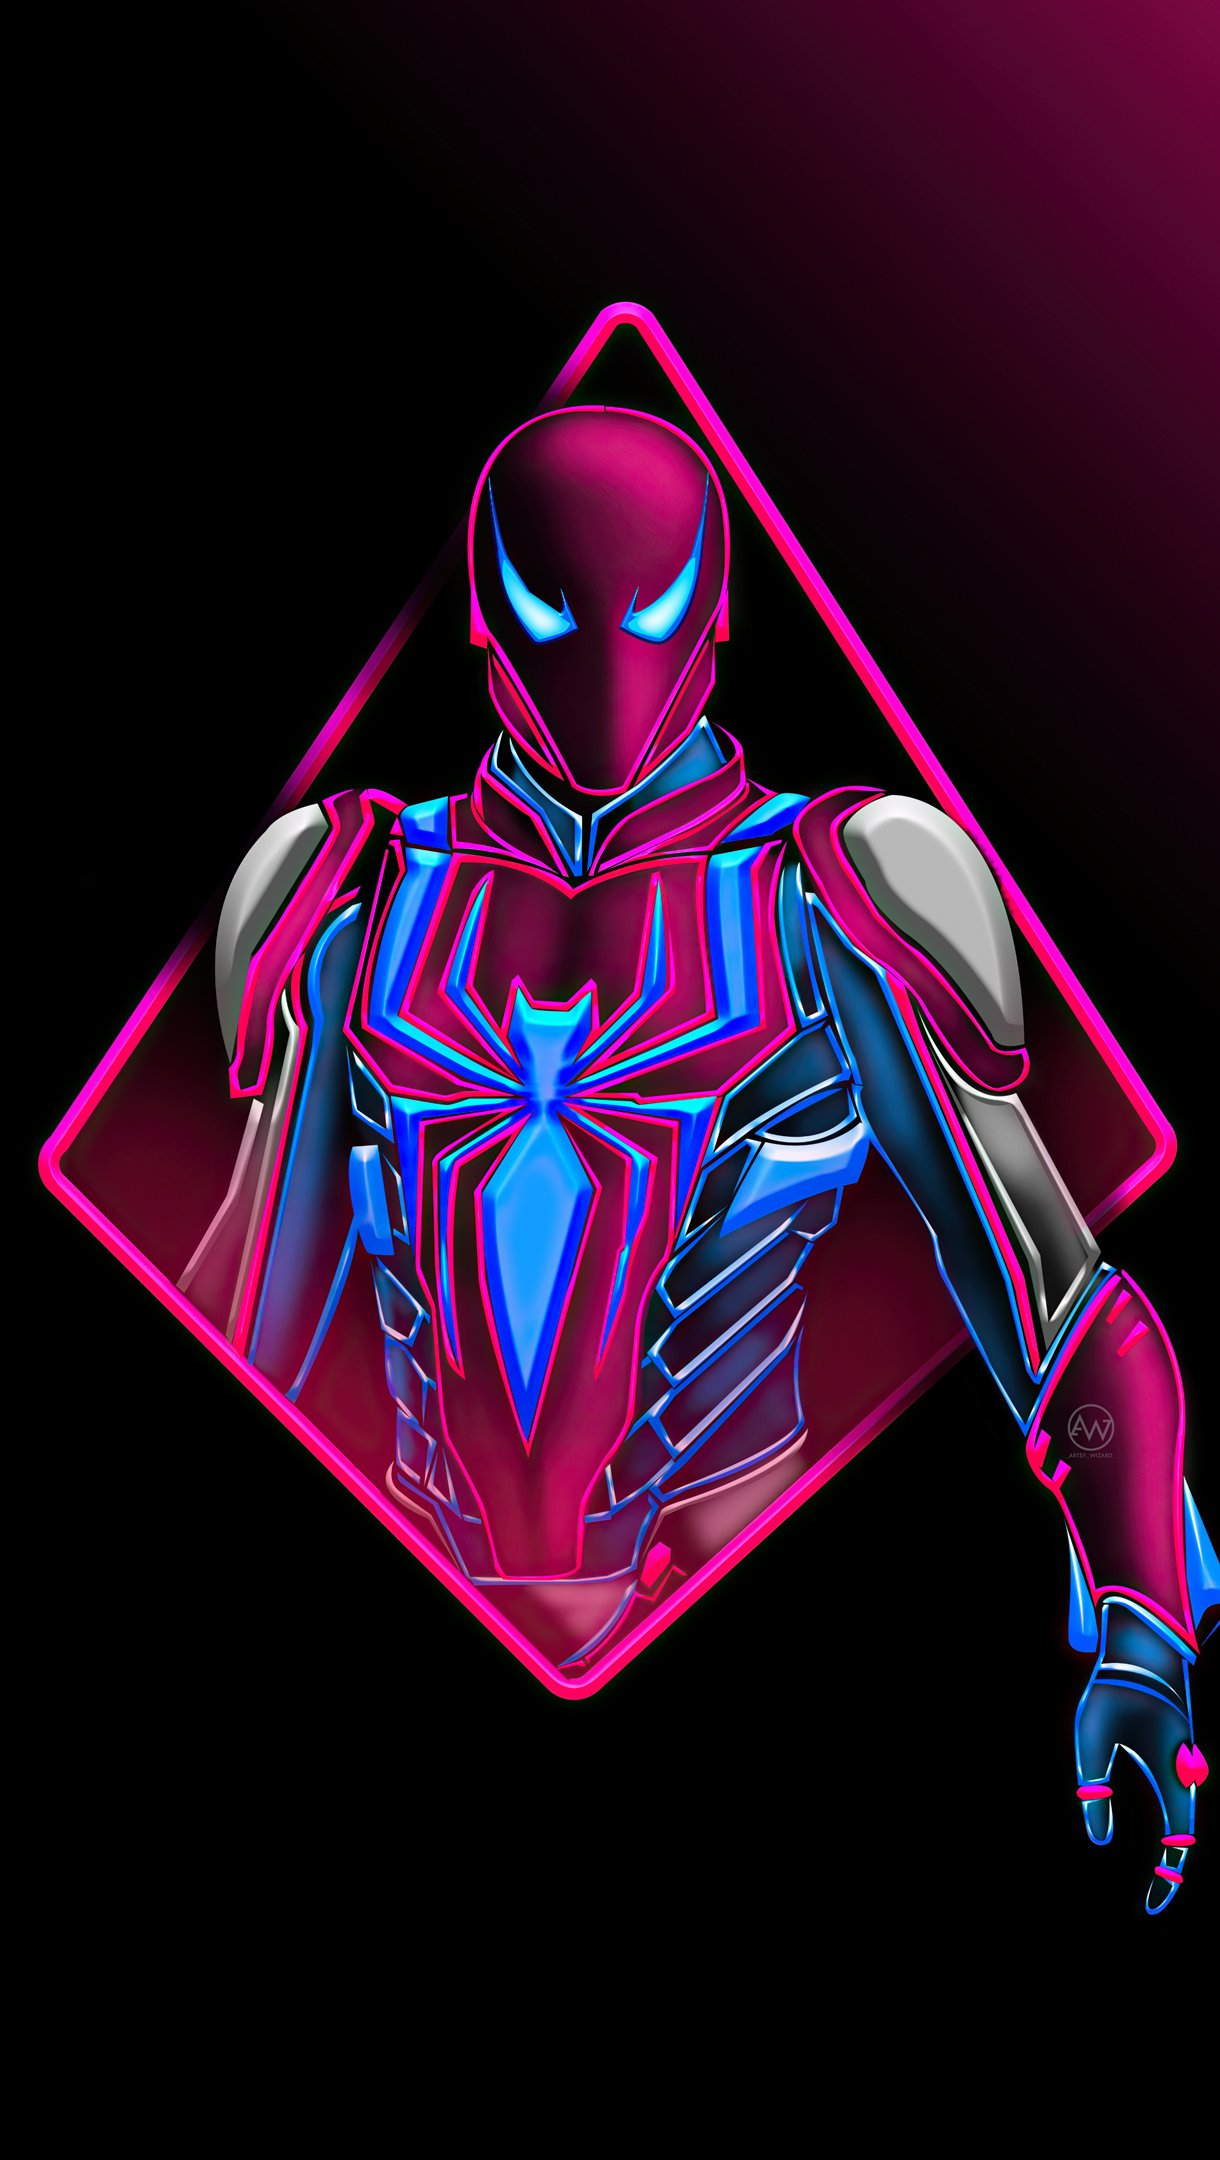 Wallpaper Spider Man Suit Minimal Vertical